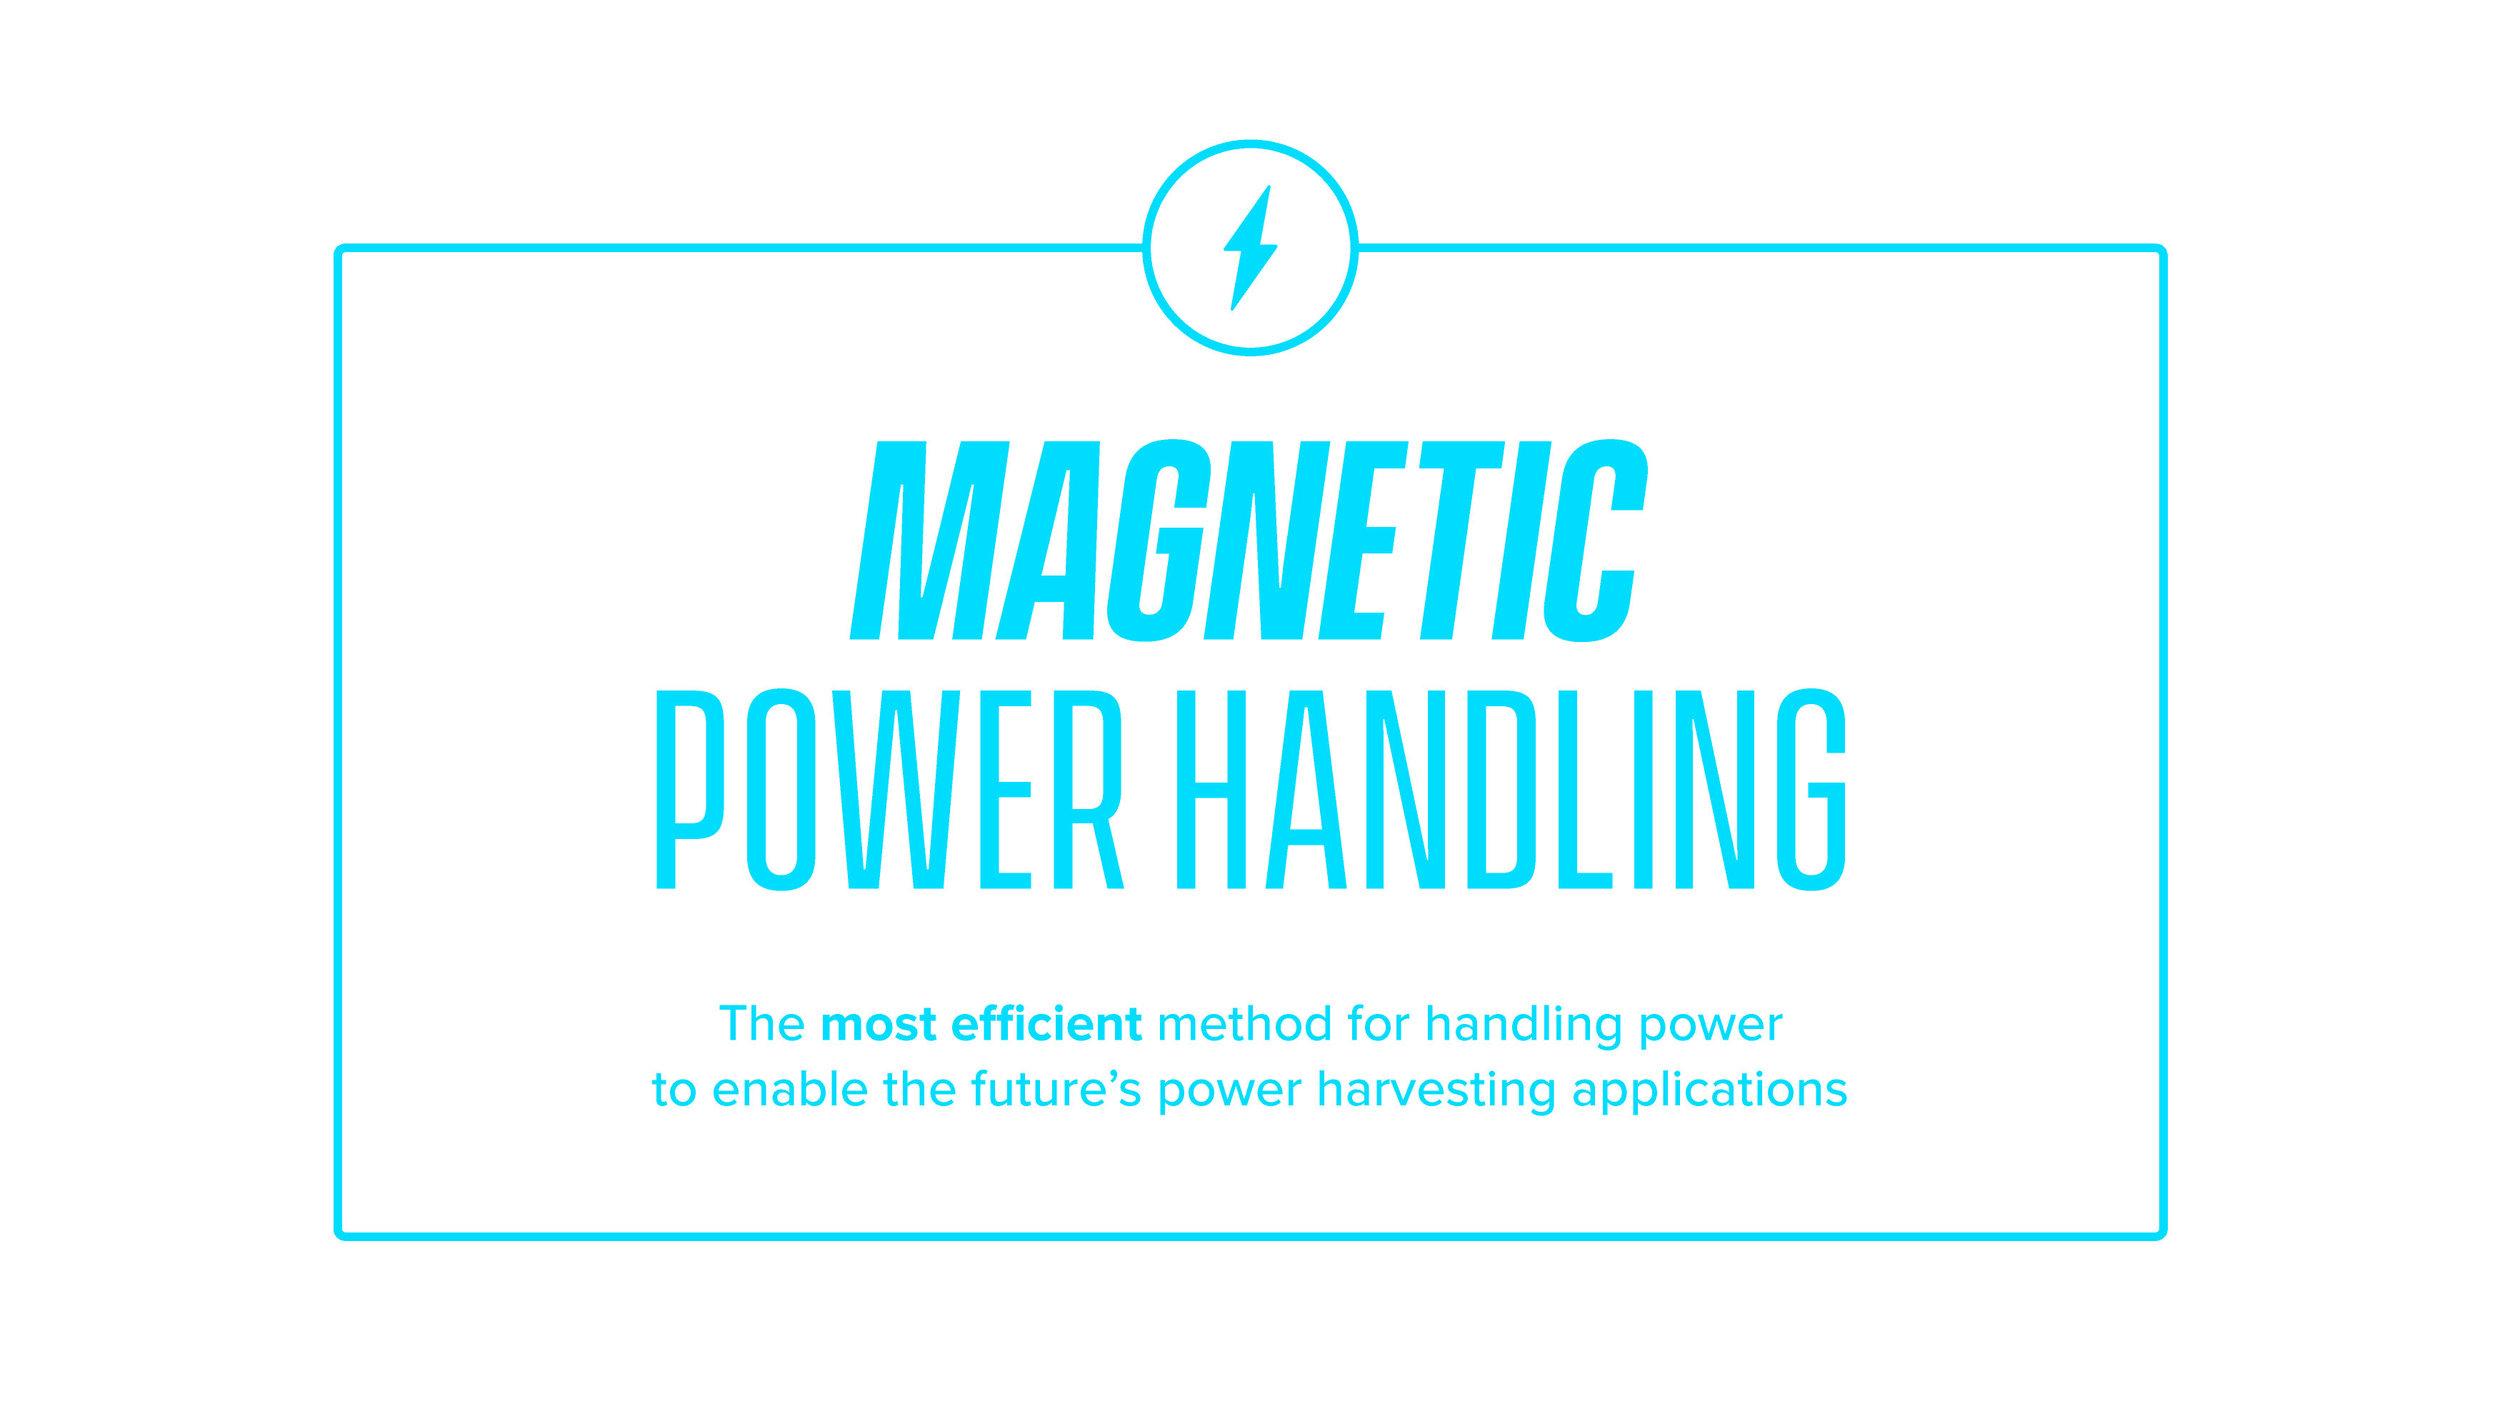 GD006-MagneticPower-Web-01.jpg